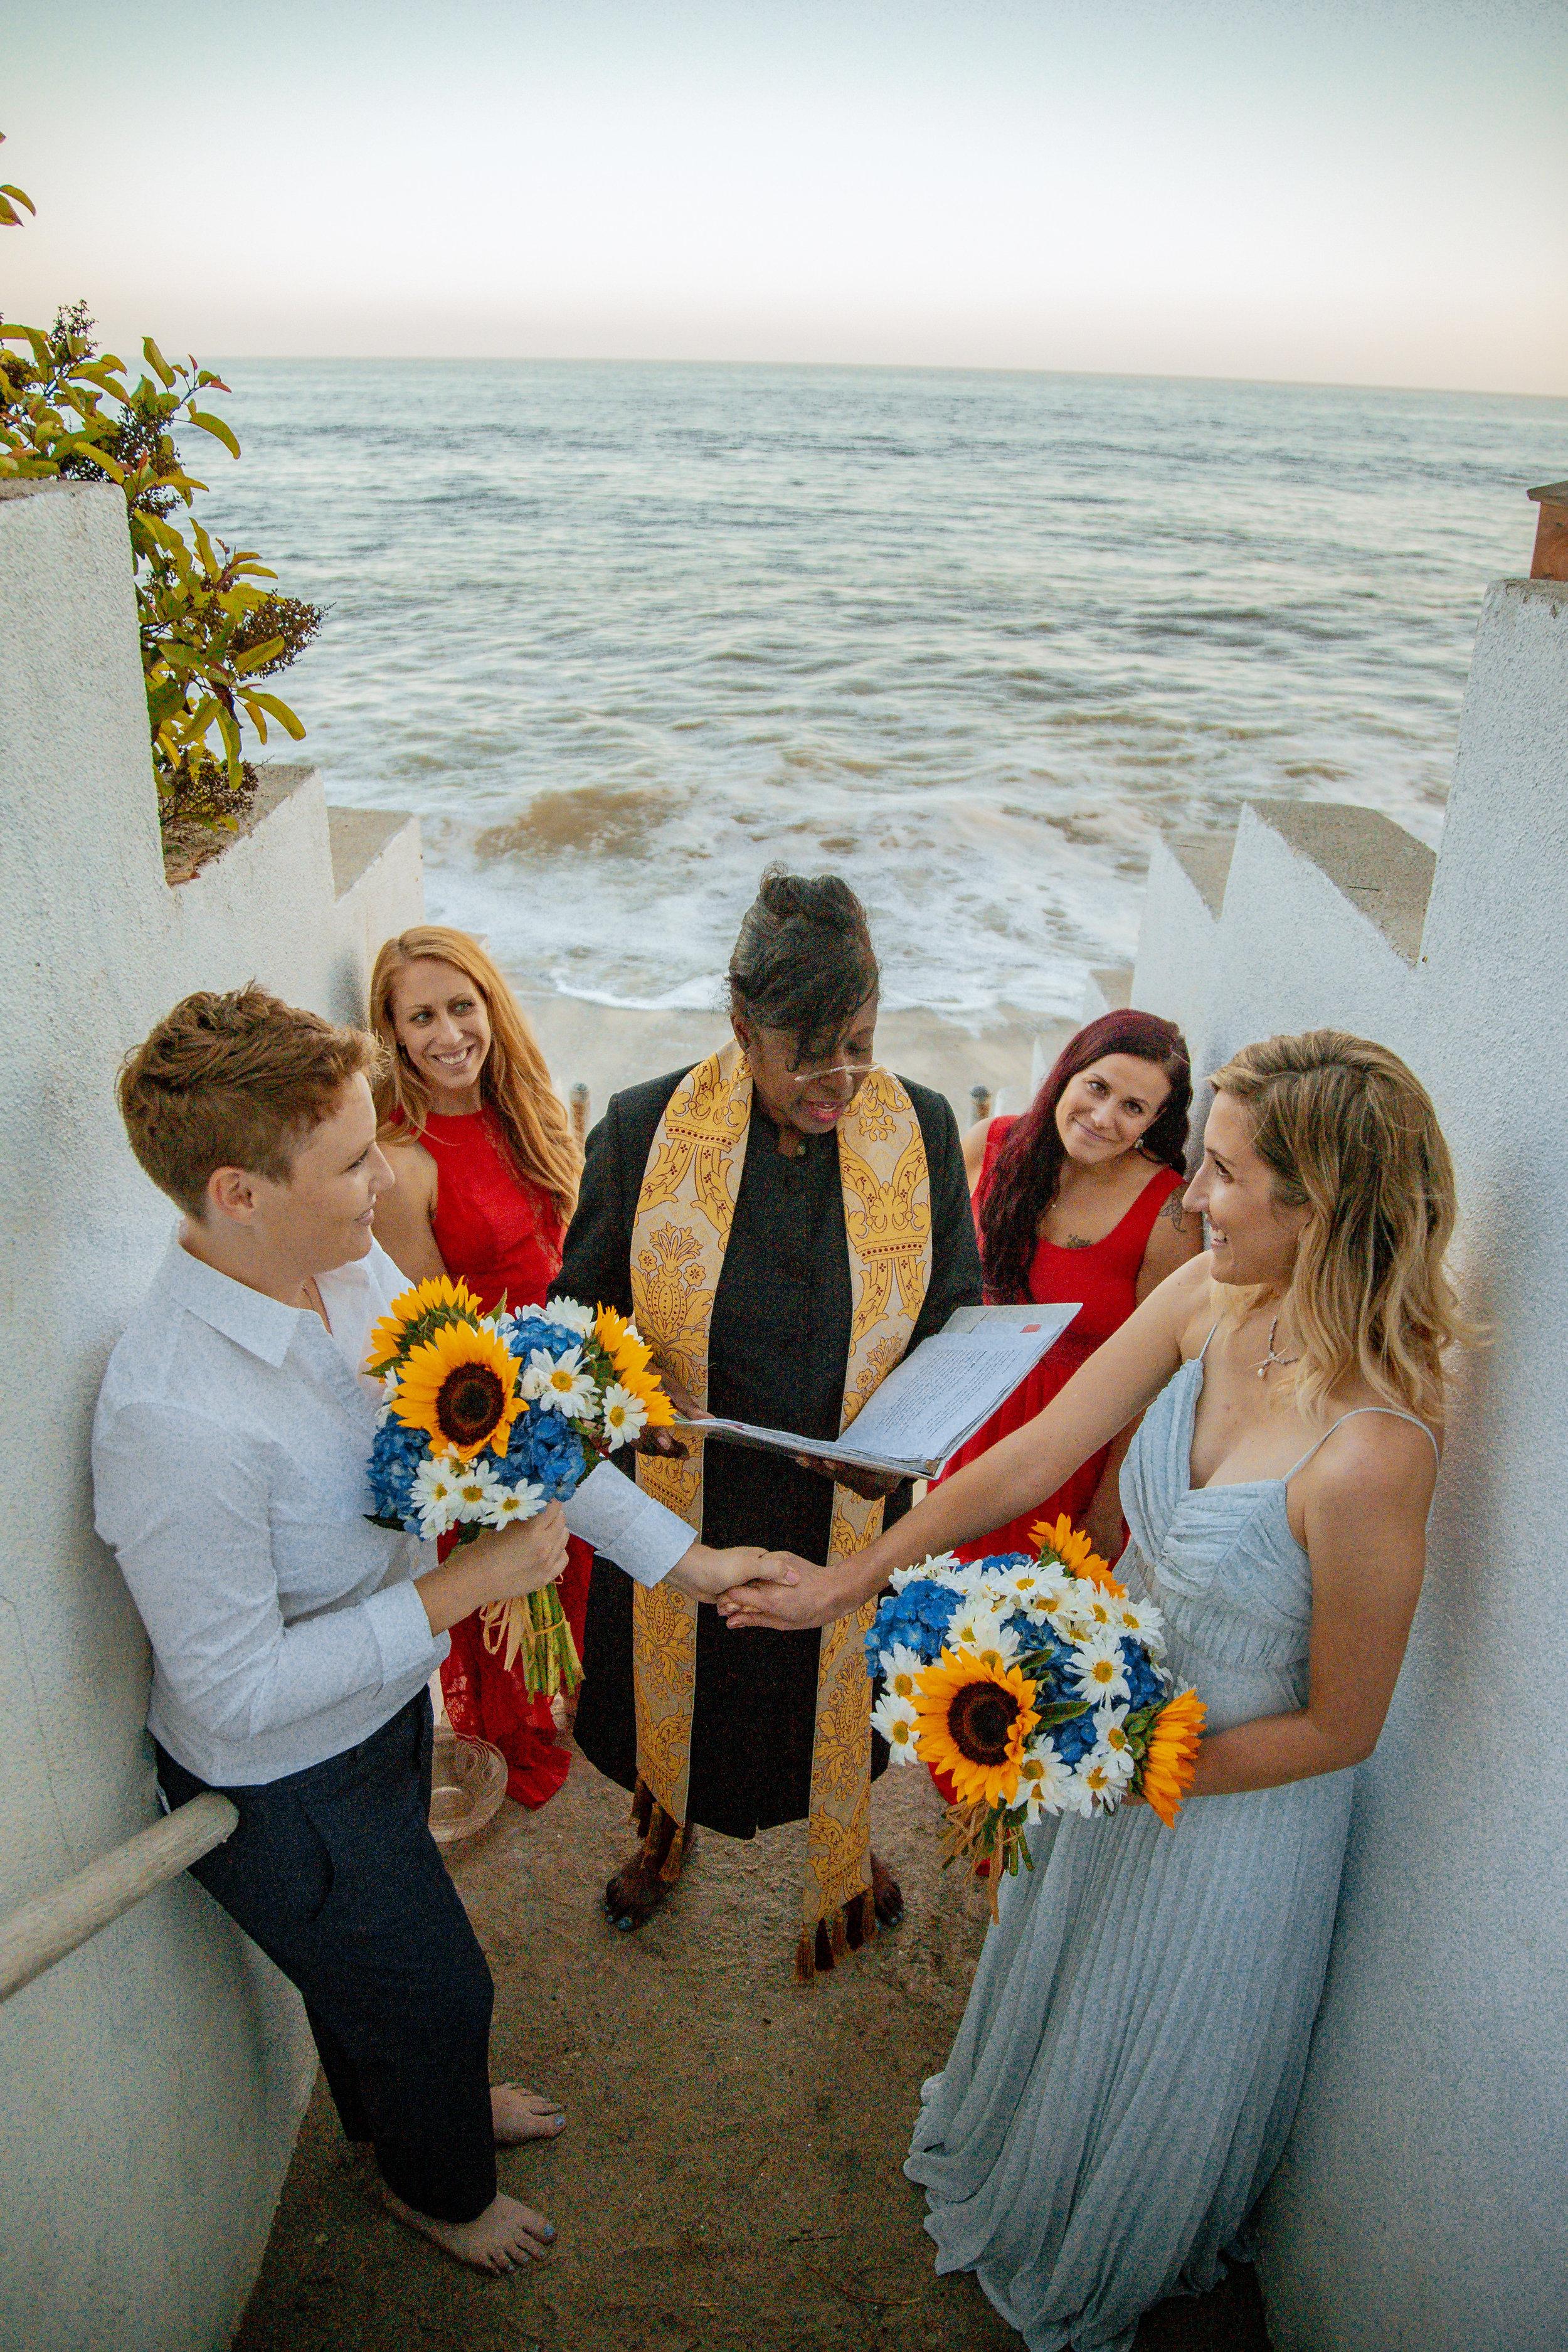 Hannah_&_Kates_Wedding_Oct_5th_2018_0_33.JPG